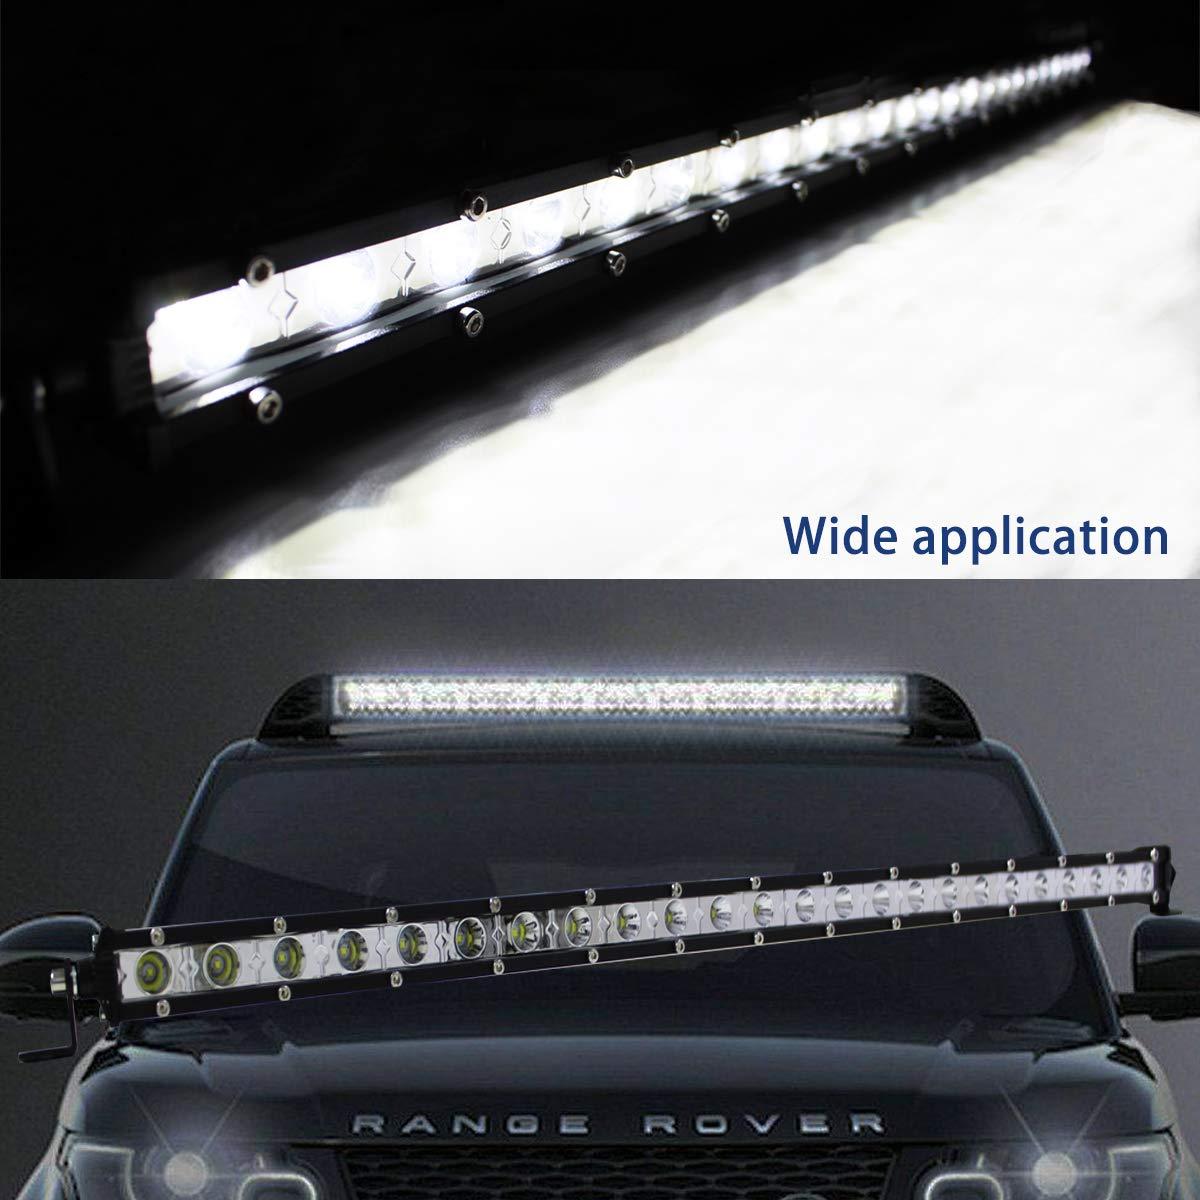 WGL 2Pcs Single Row Led Light Bar 4D 30W Spot LED Working Light White Driving Light Vehicle Off Road Fog Light Roof Bumper Light Bars for Truck SUV ATV Car Boat WGLled